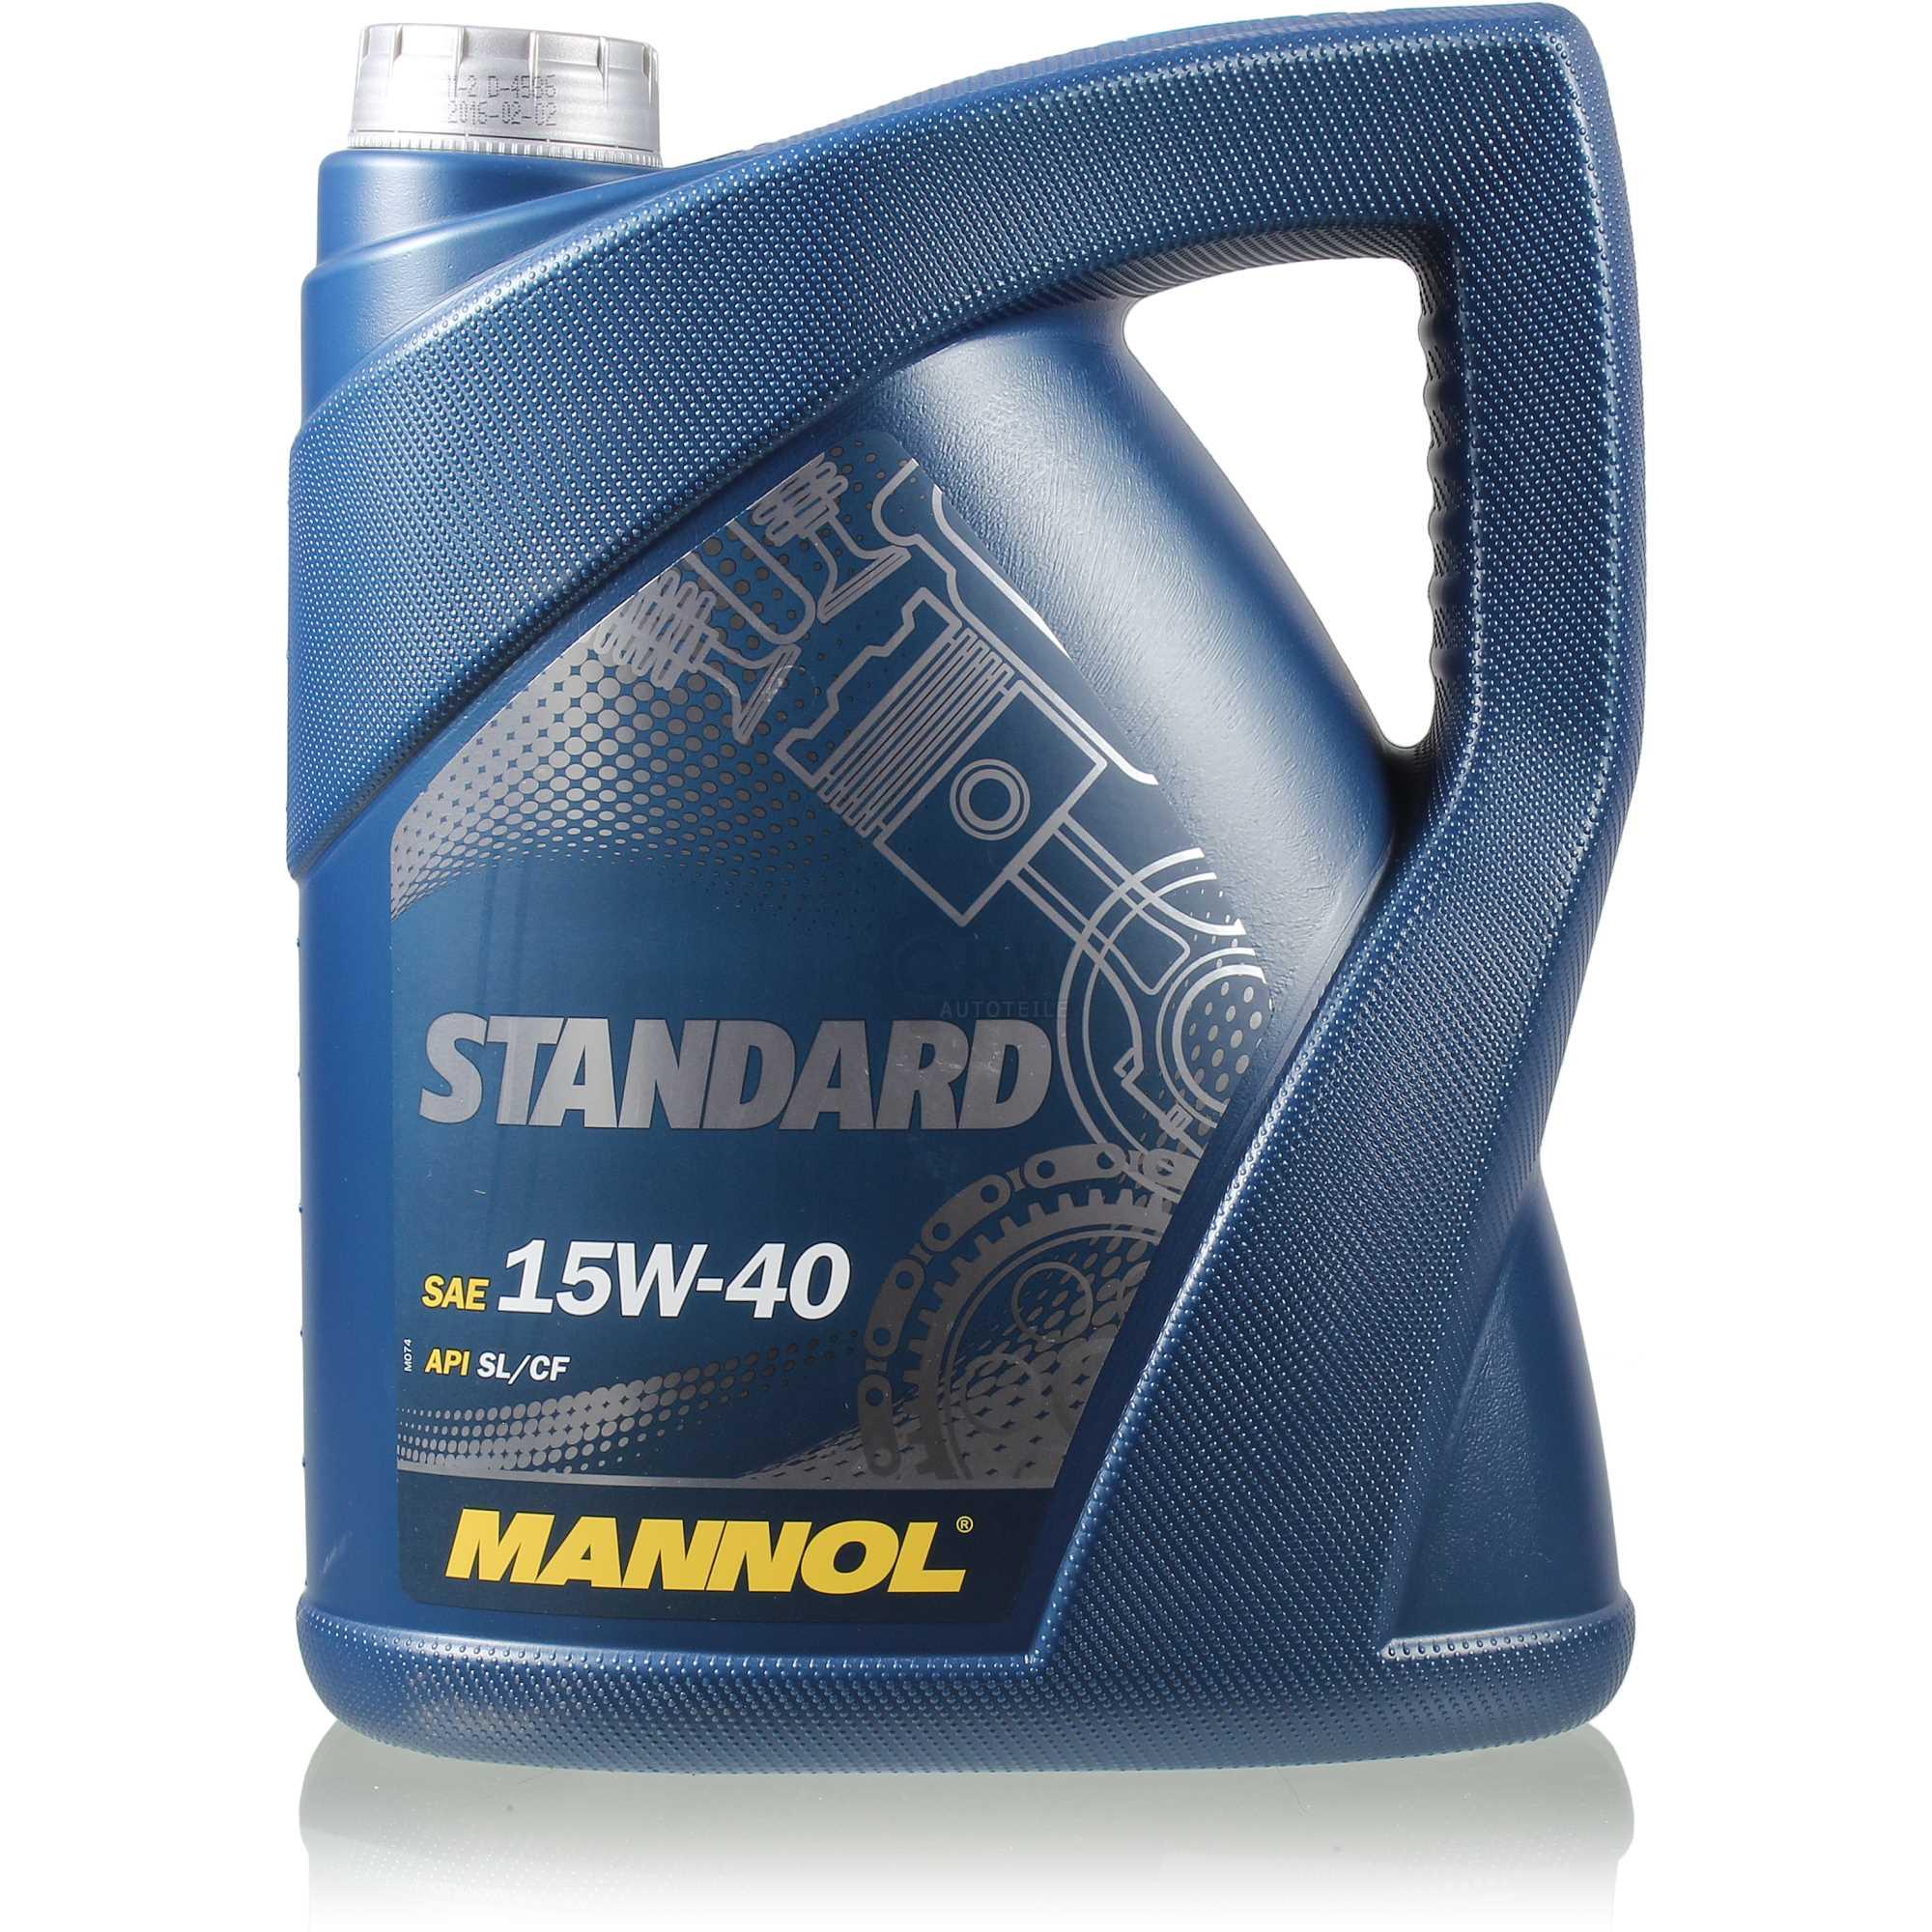 5l-aceite-del-motor-MANNOL-5w-40-10w-40-15w-40-5w-30-motorspulung-motor-flush-limpiador miniatura 11